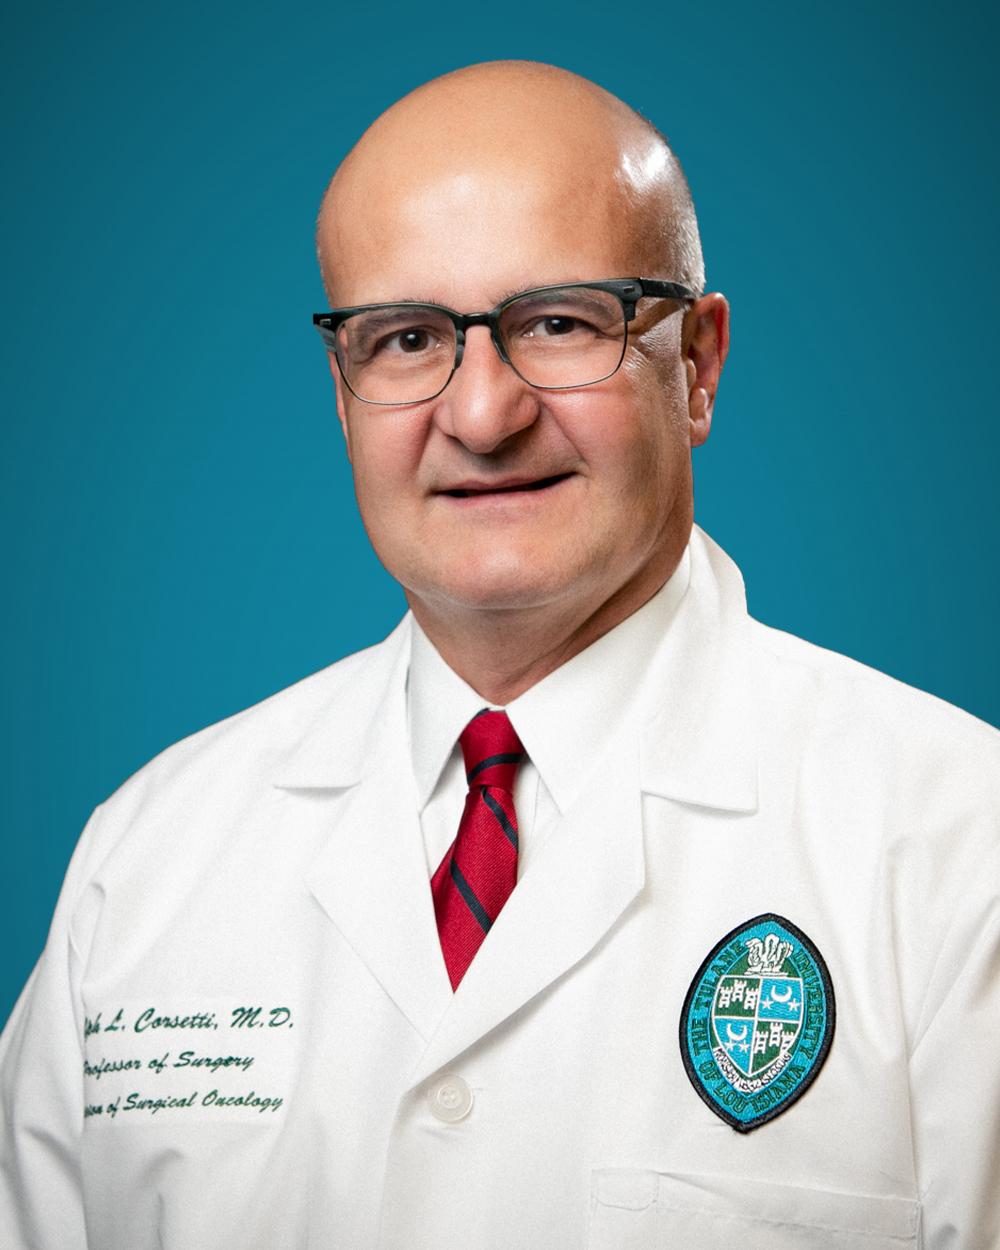 Ralph Corsetti, MD